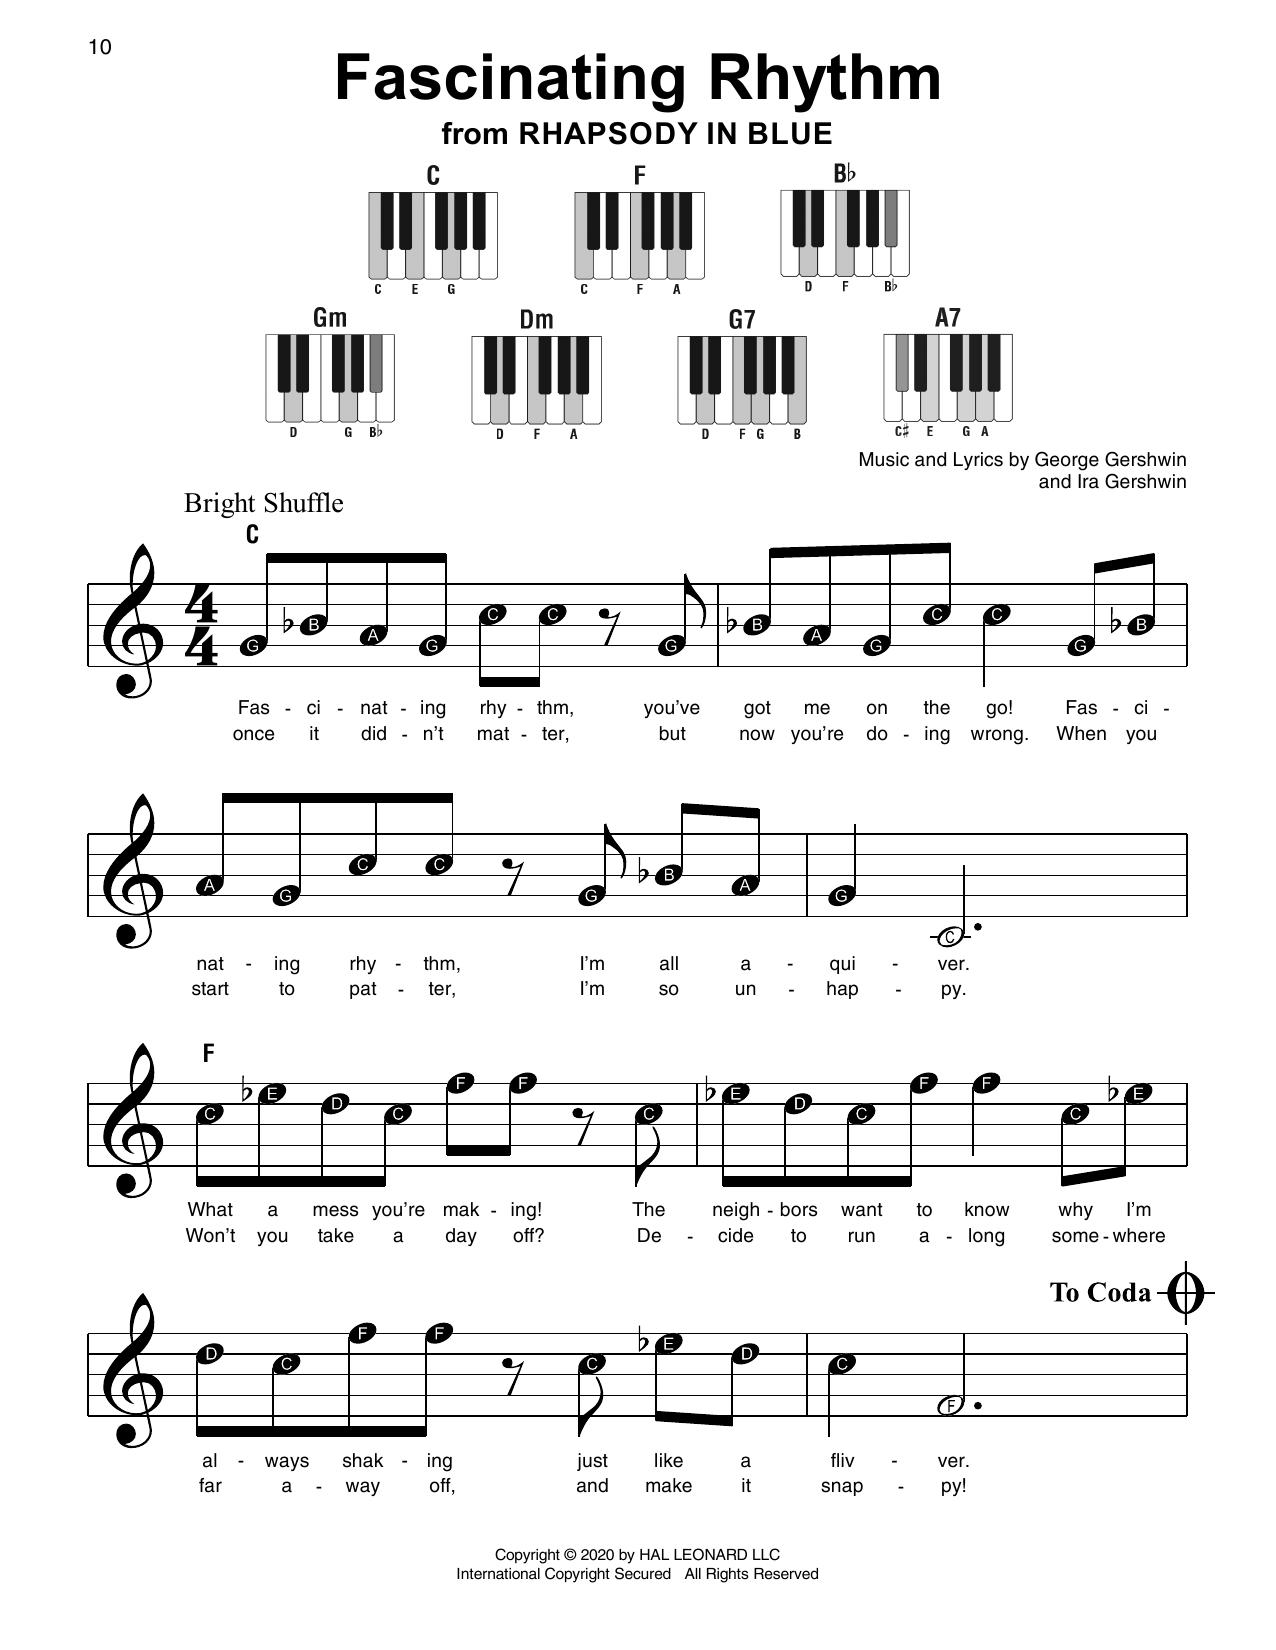 George Gershwin Ira Gershwin Fascinating Rhythm From Rhapsody In Blue Sheet Music Notes Chords Sheet Music Notes Sheet Music Gershwin